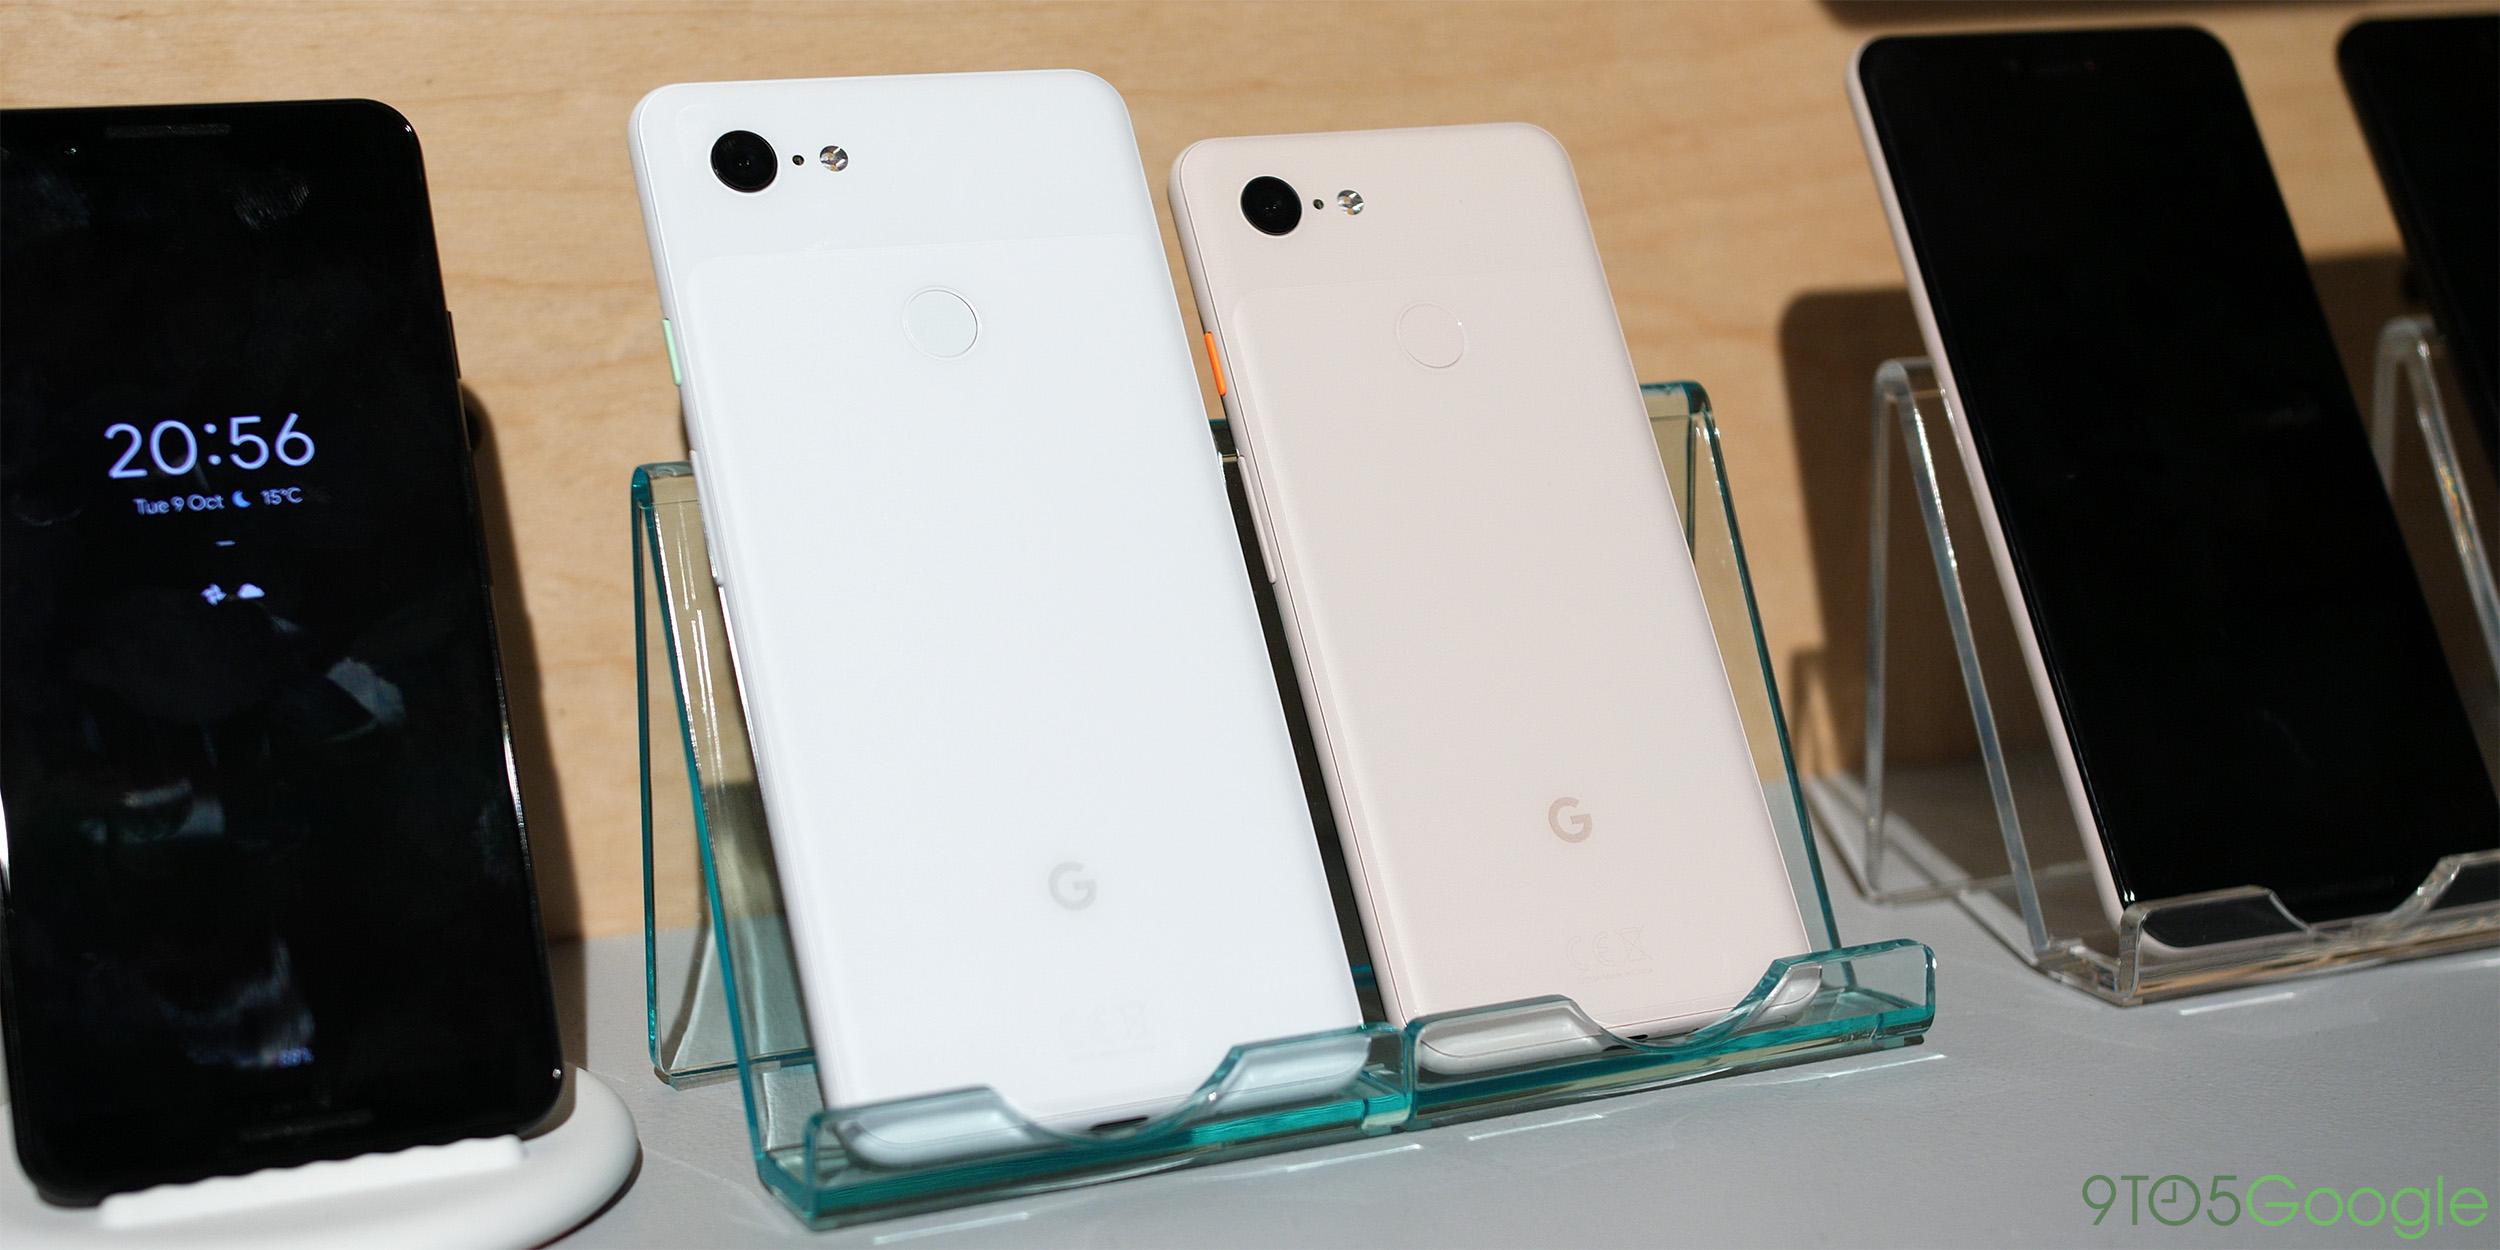 google pixel 3 xl teardown confirms samsung amoled display gives peek at titan m chip